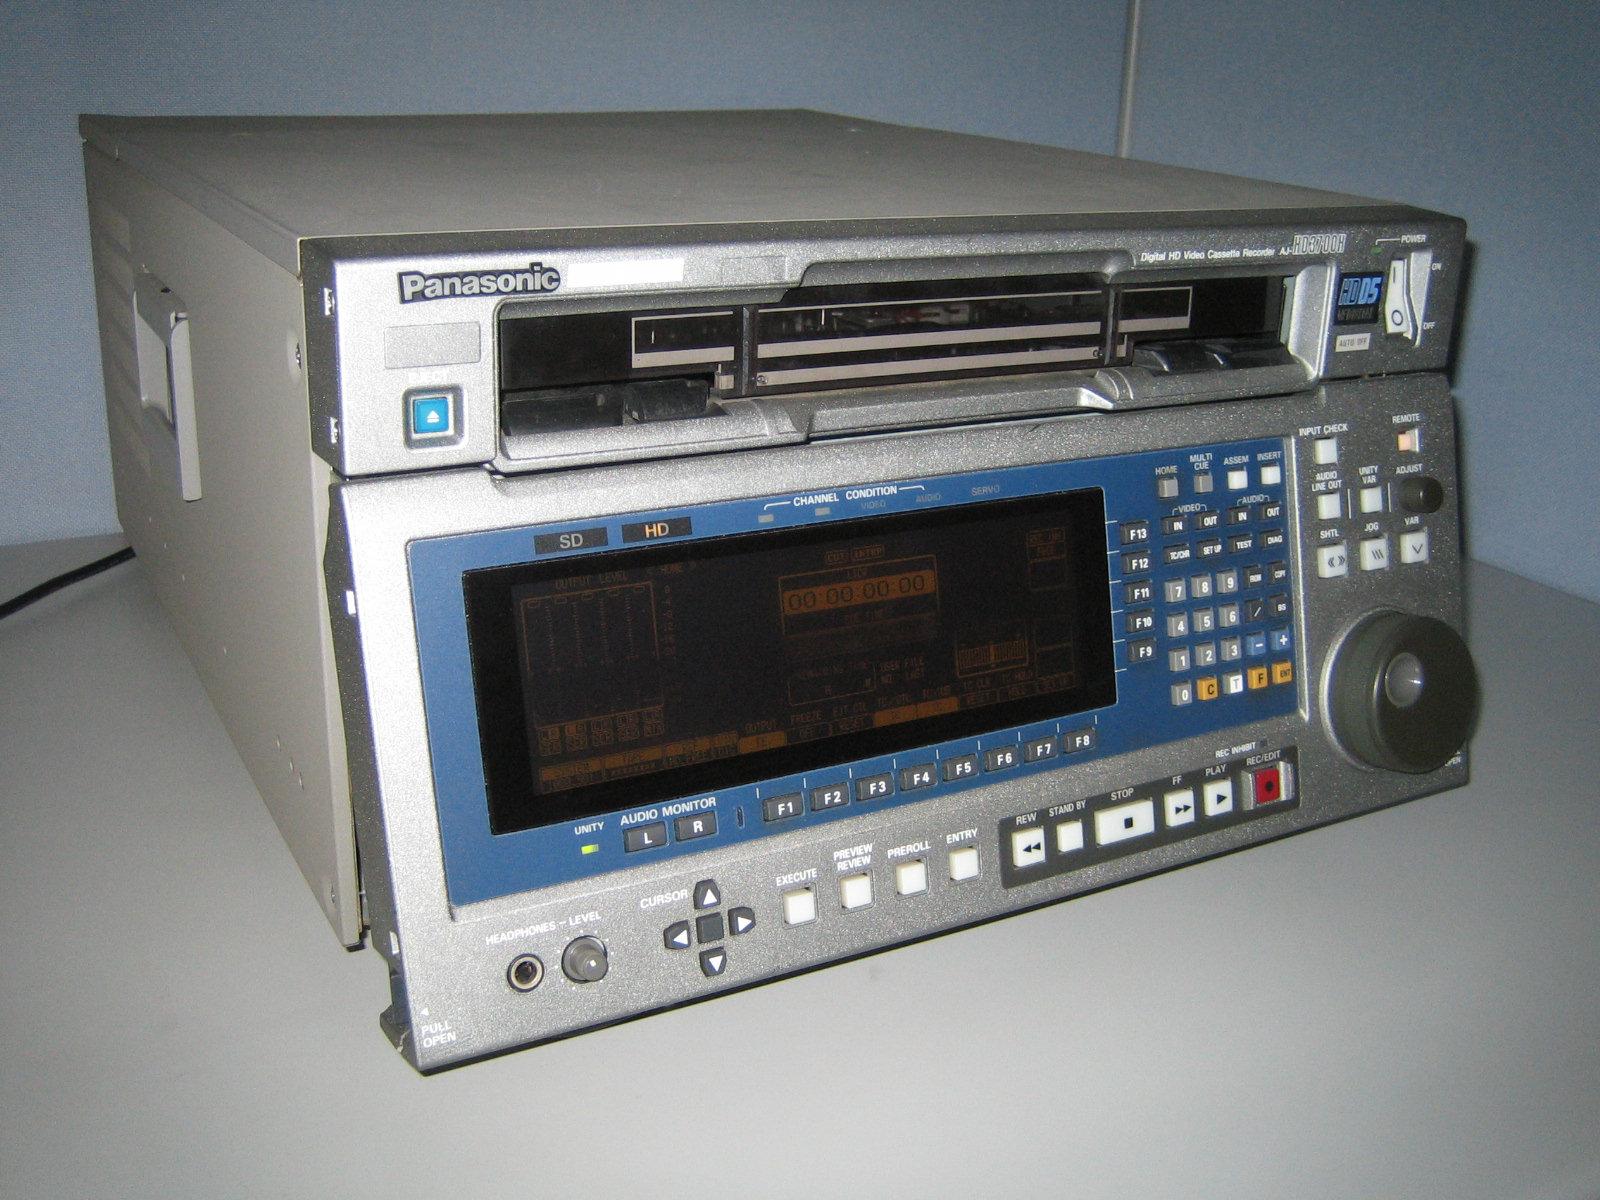 1995 Panasonic D5 Digital VTR, model AJ-HD3700H